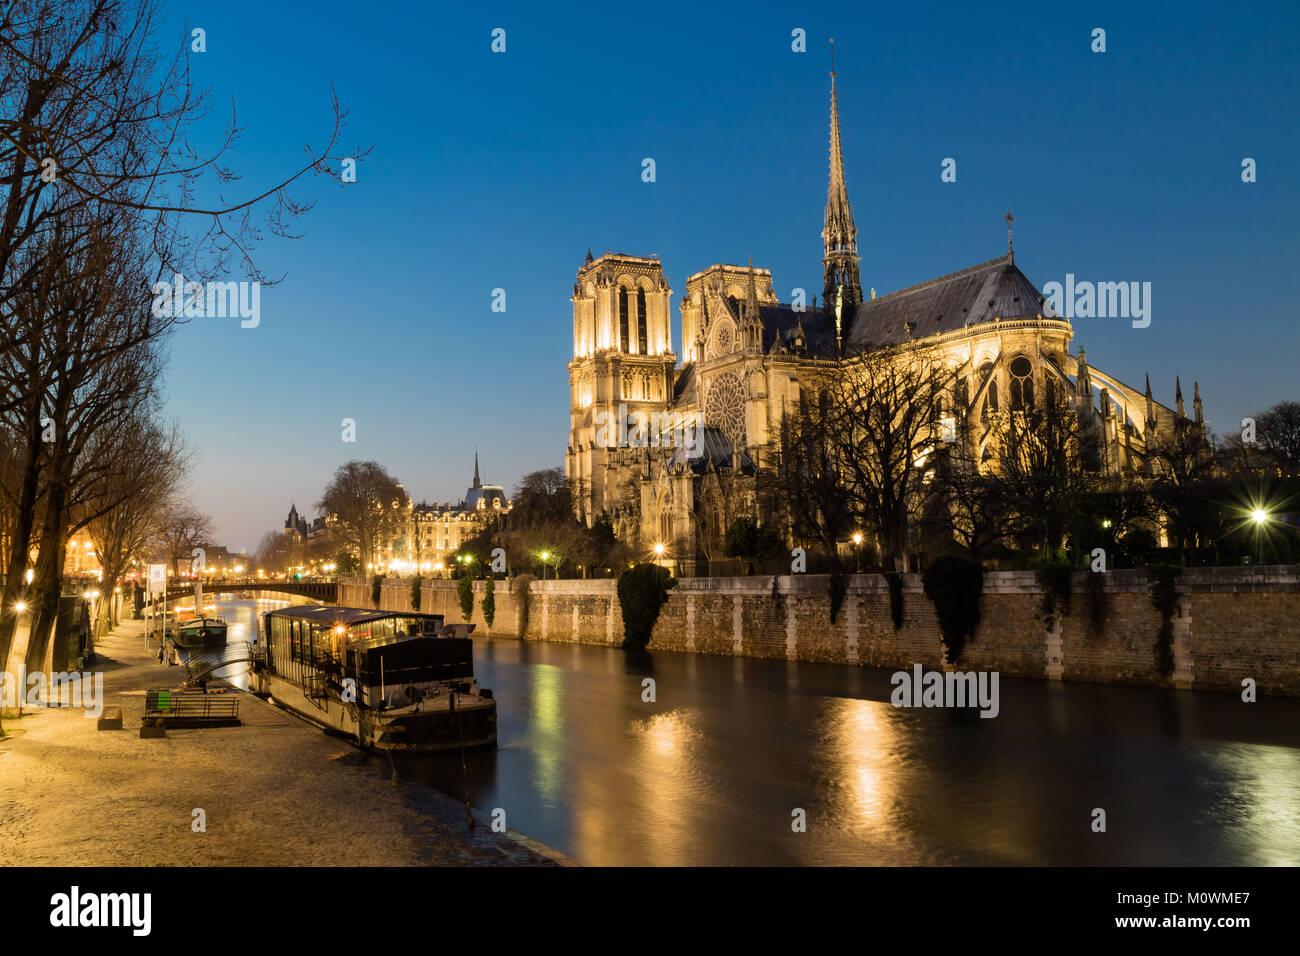 Notre Dame de Paris in night time, France Stock Photo